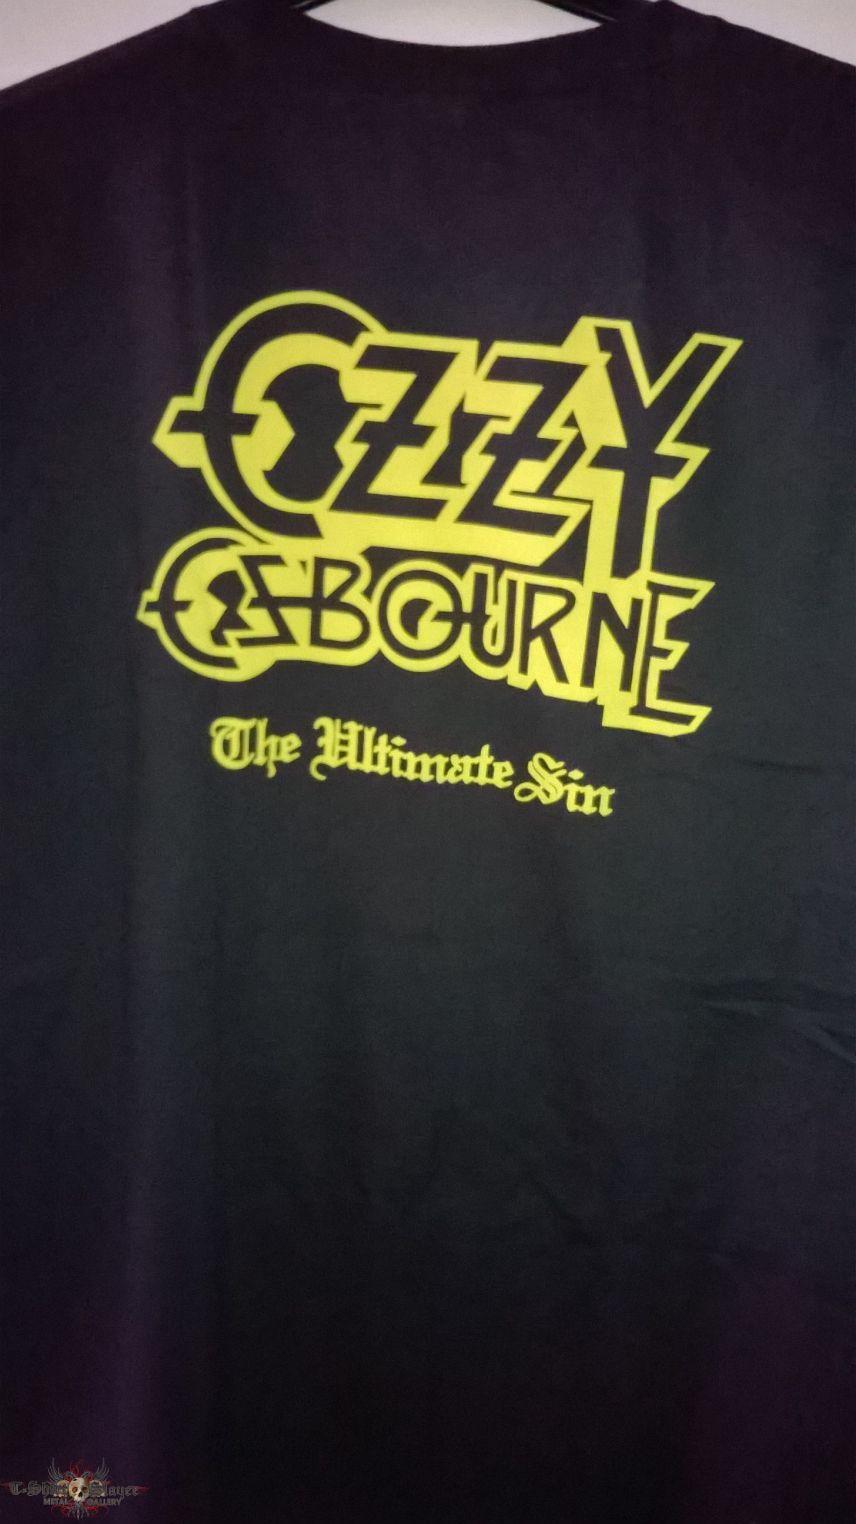 Ozzy Osbourne The Ultimate Sin Shirt